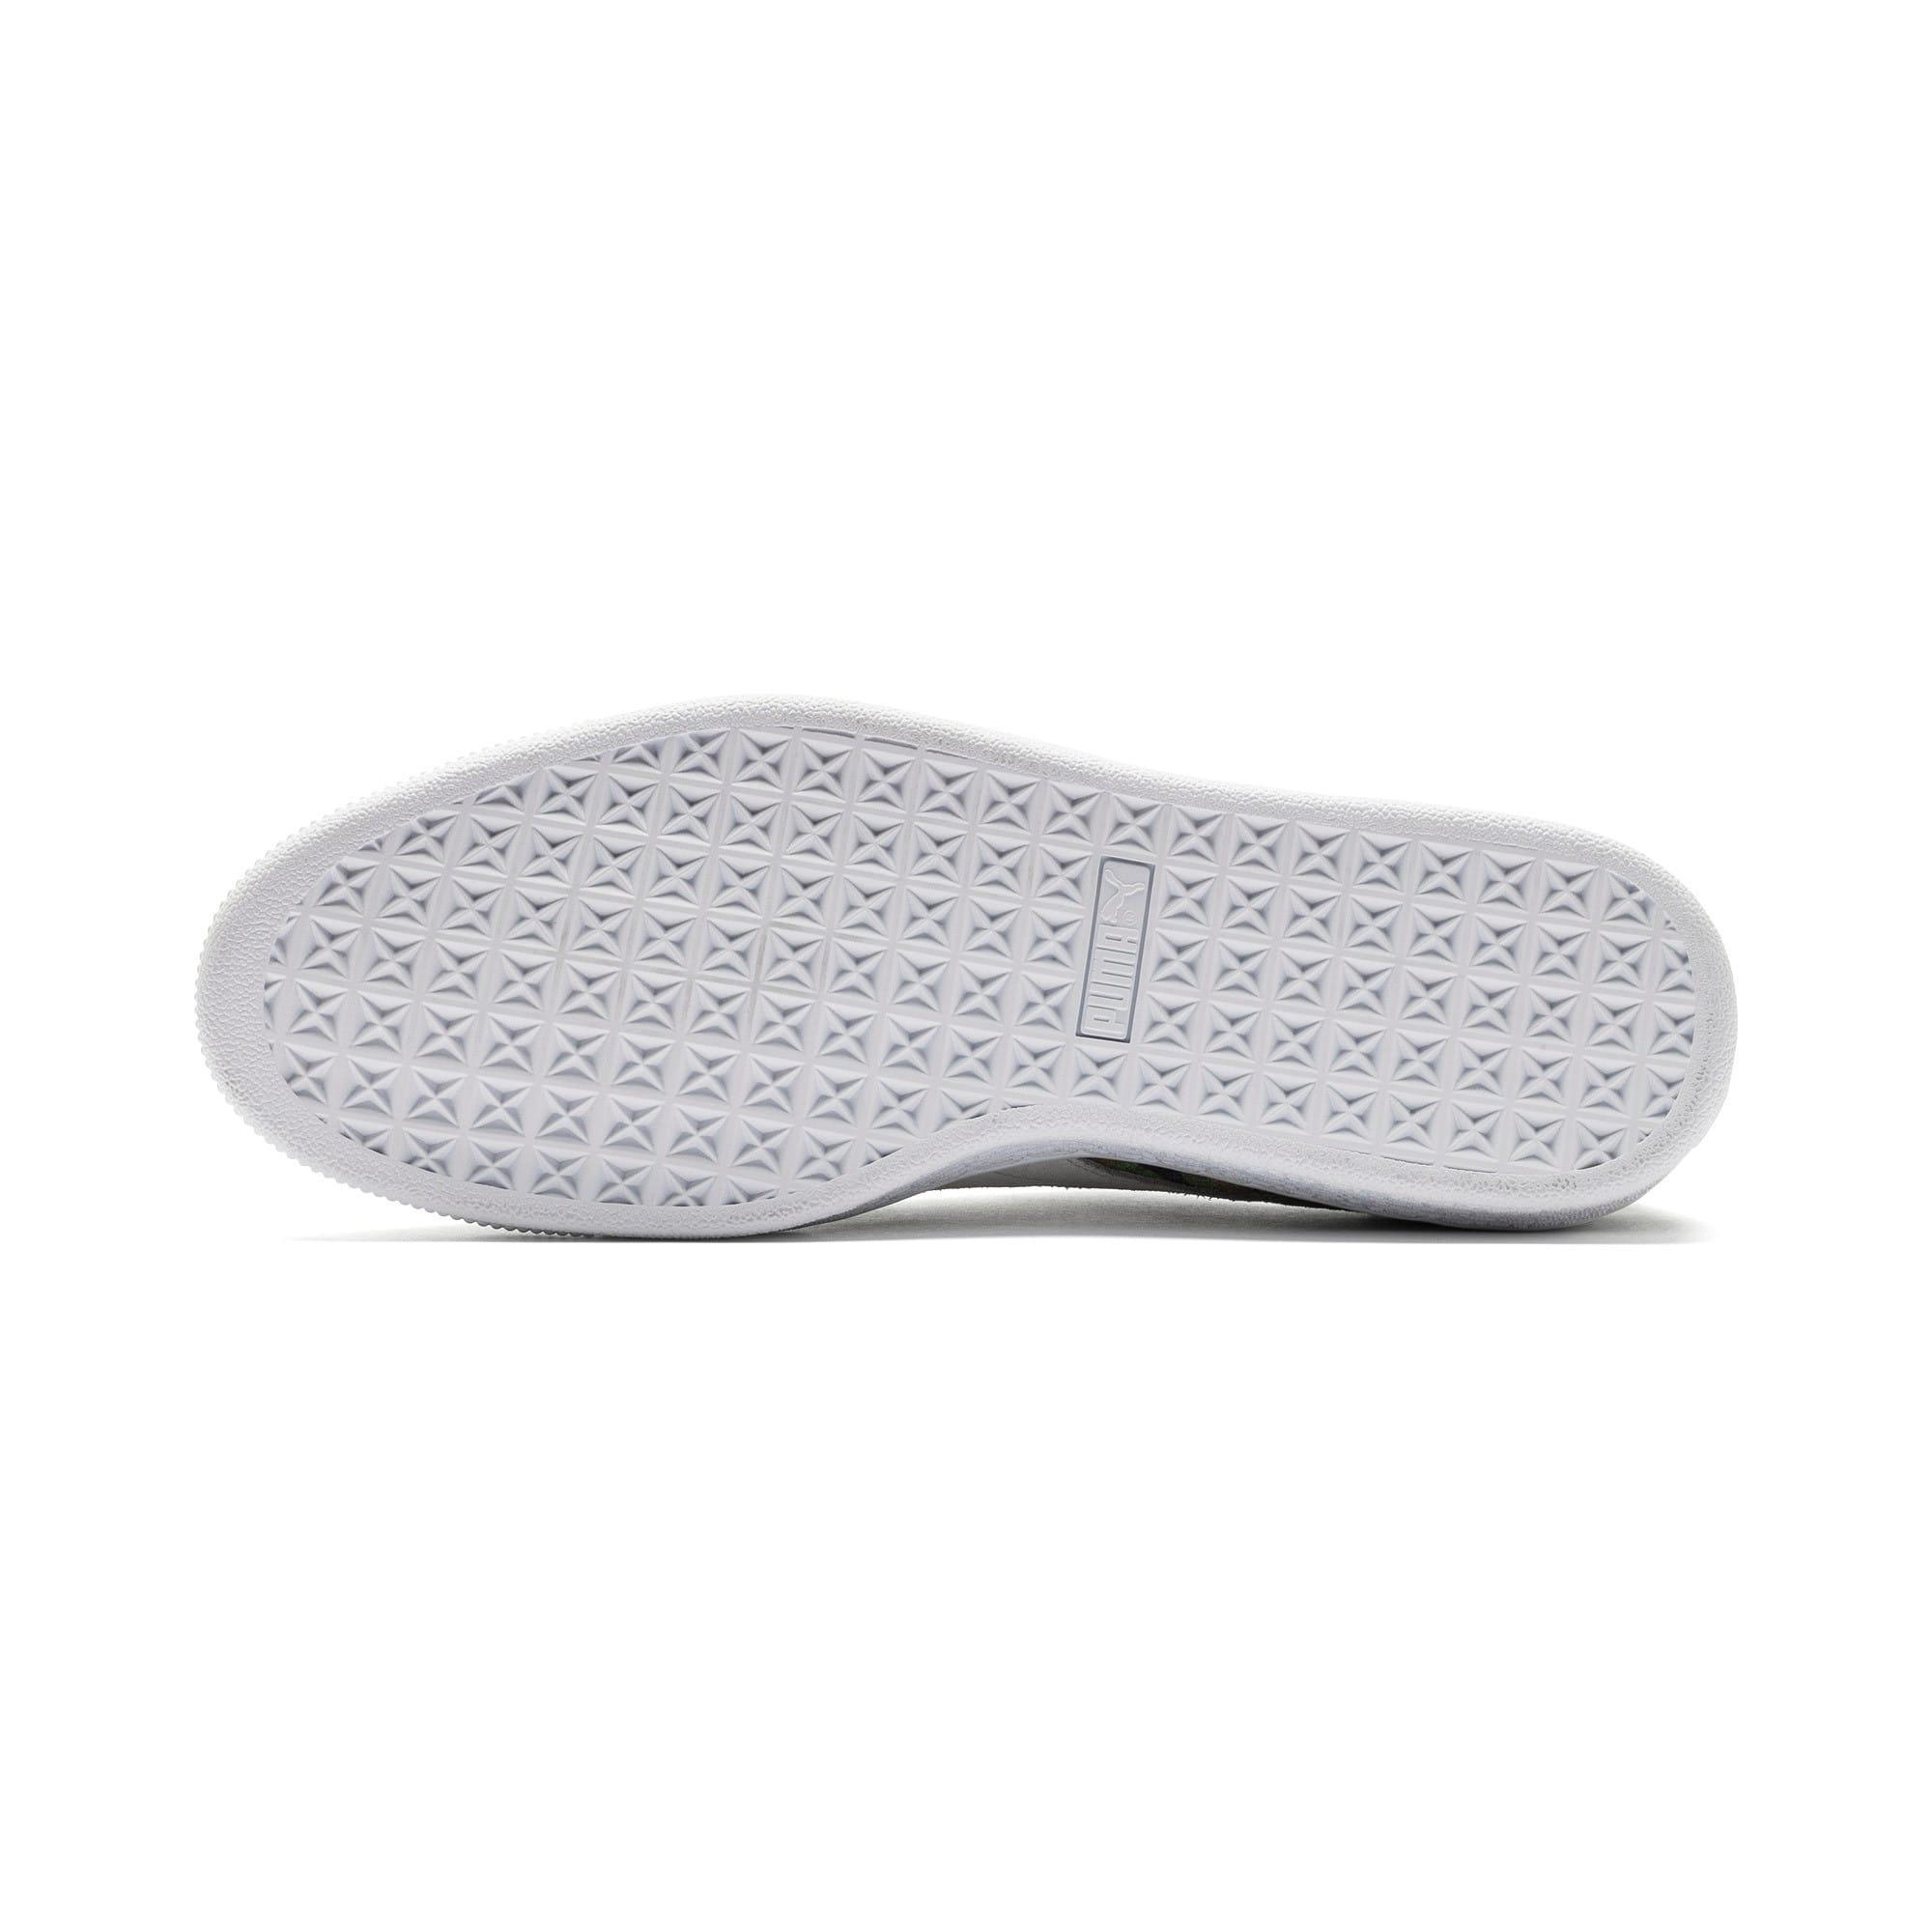 Thumbnail 4 of Suede Classic Ambush Sneakers, Dachsund-Green-Black-White, medium